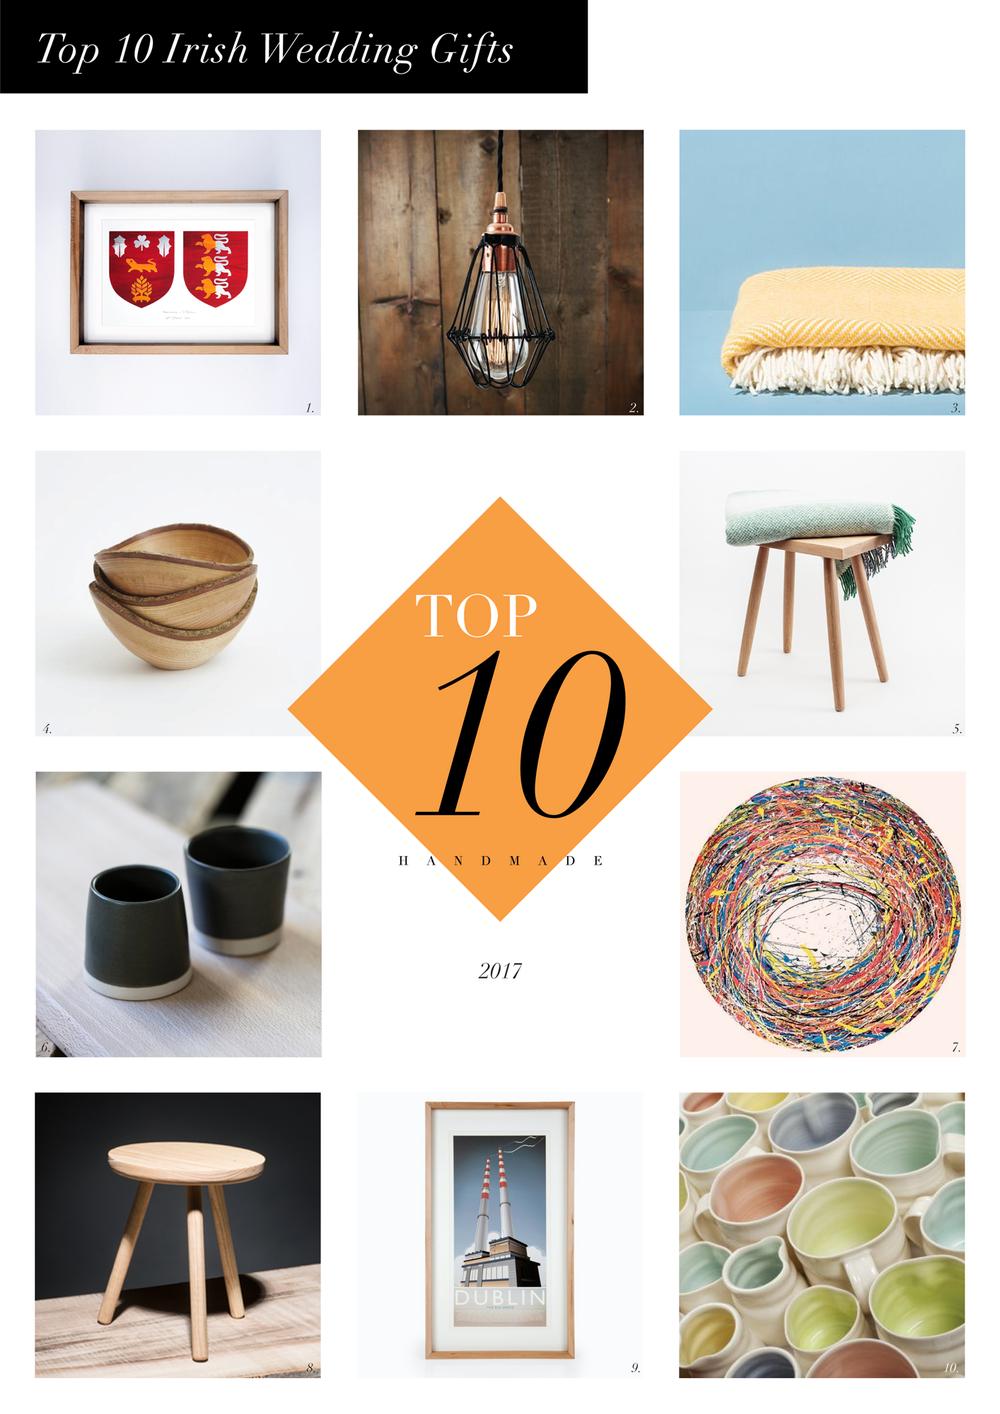 Top 10 Irish Wedding Gifts